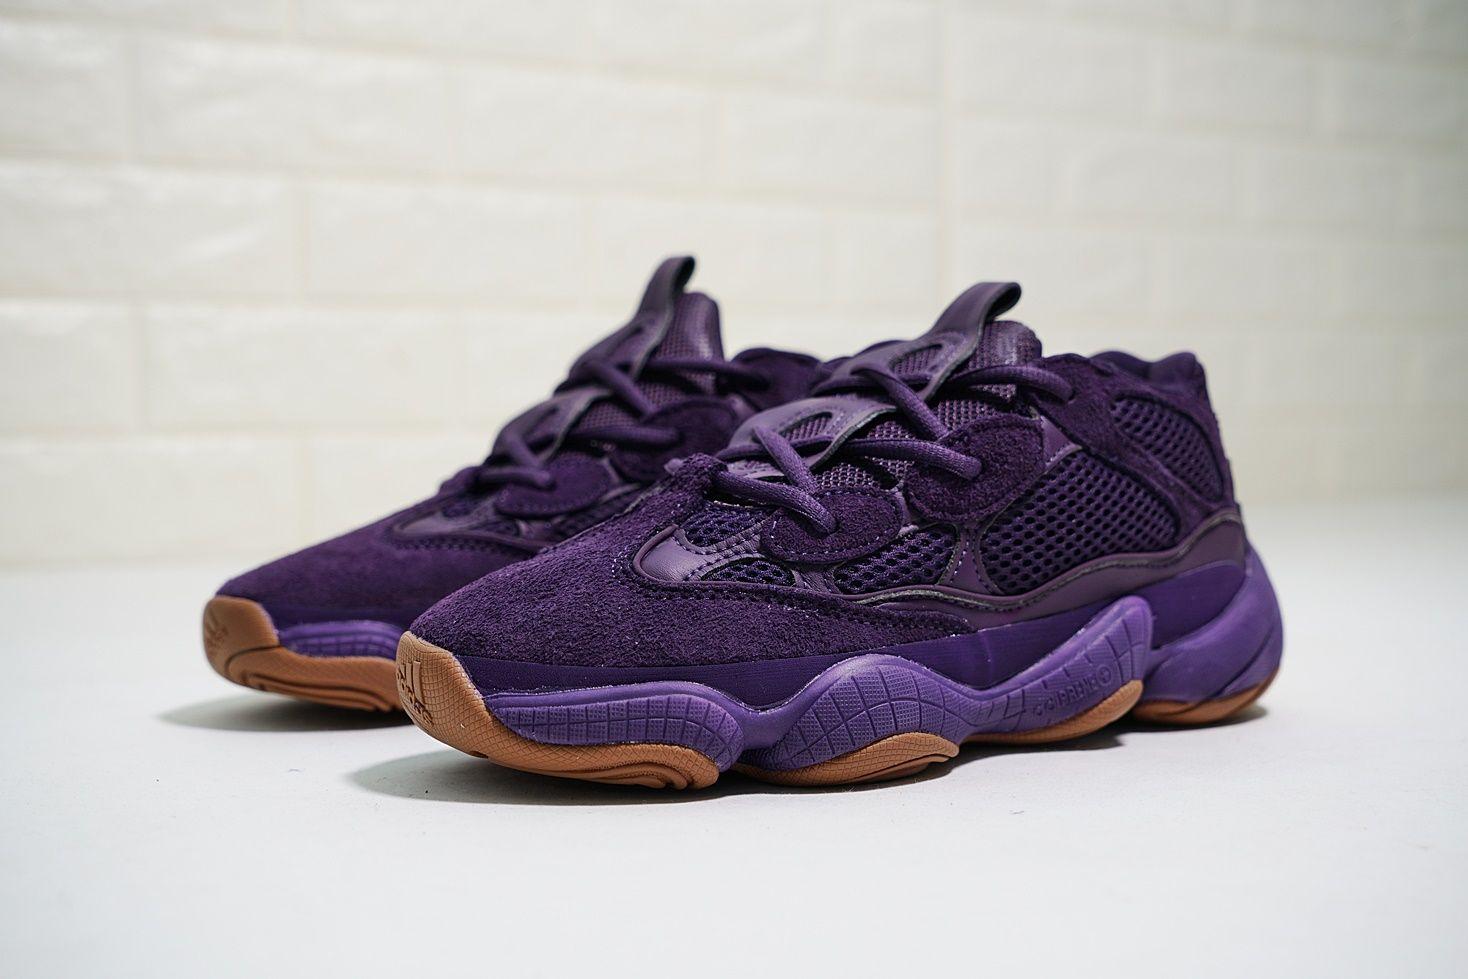 62ab8bd37 kanye west x adidas yeezy 500 ultraviolet 女款椰子透氣復古老爹鞋 ...